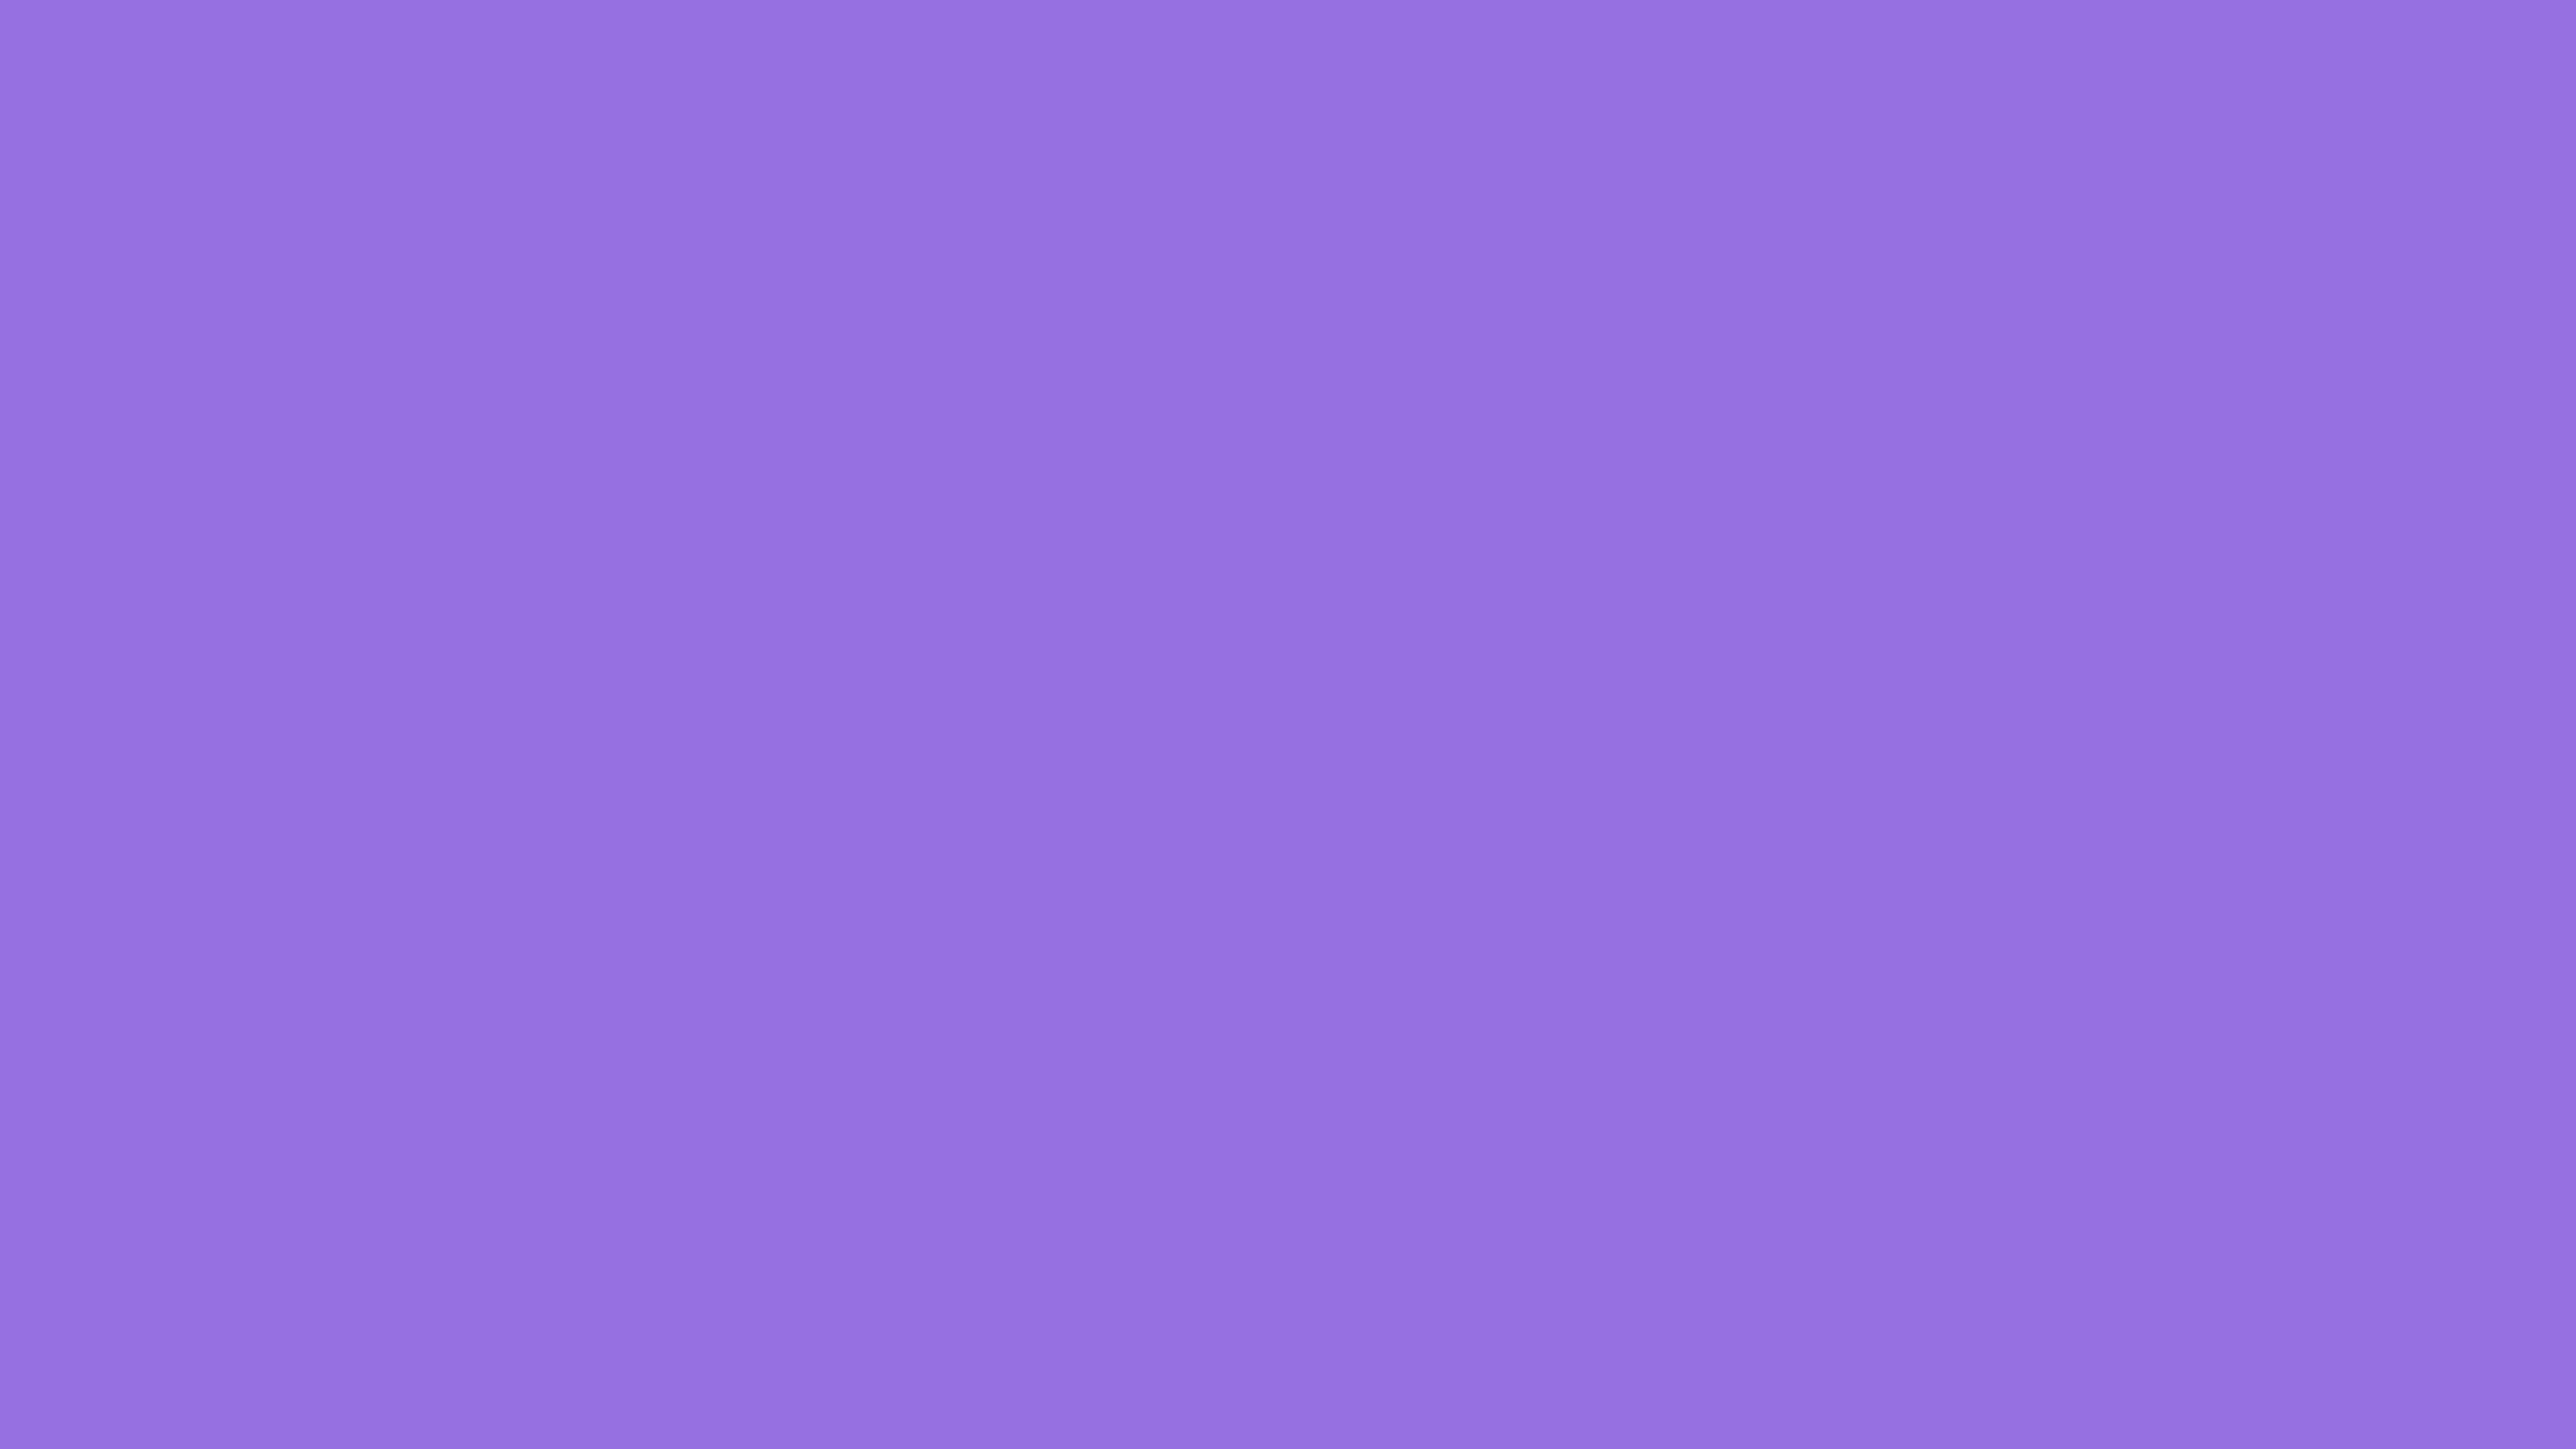 5120x2880 Medium Purple Solid Color Background